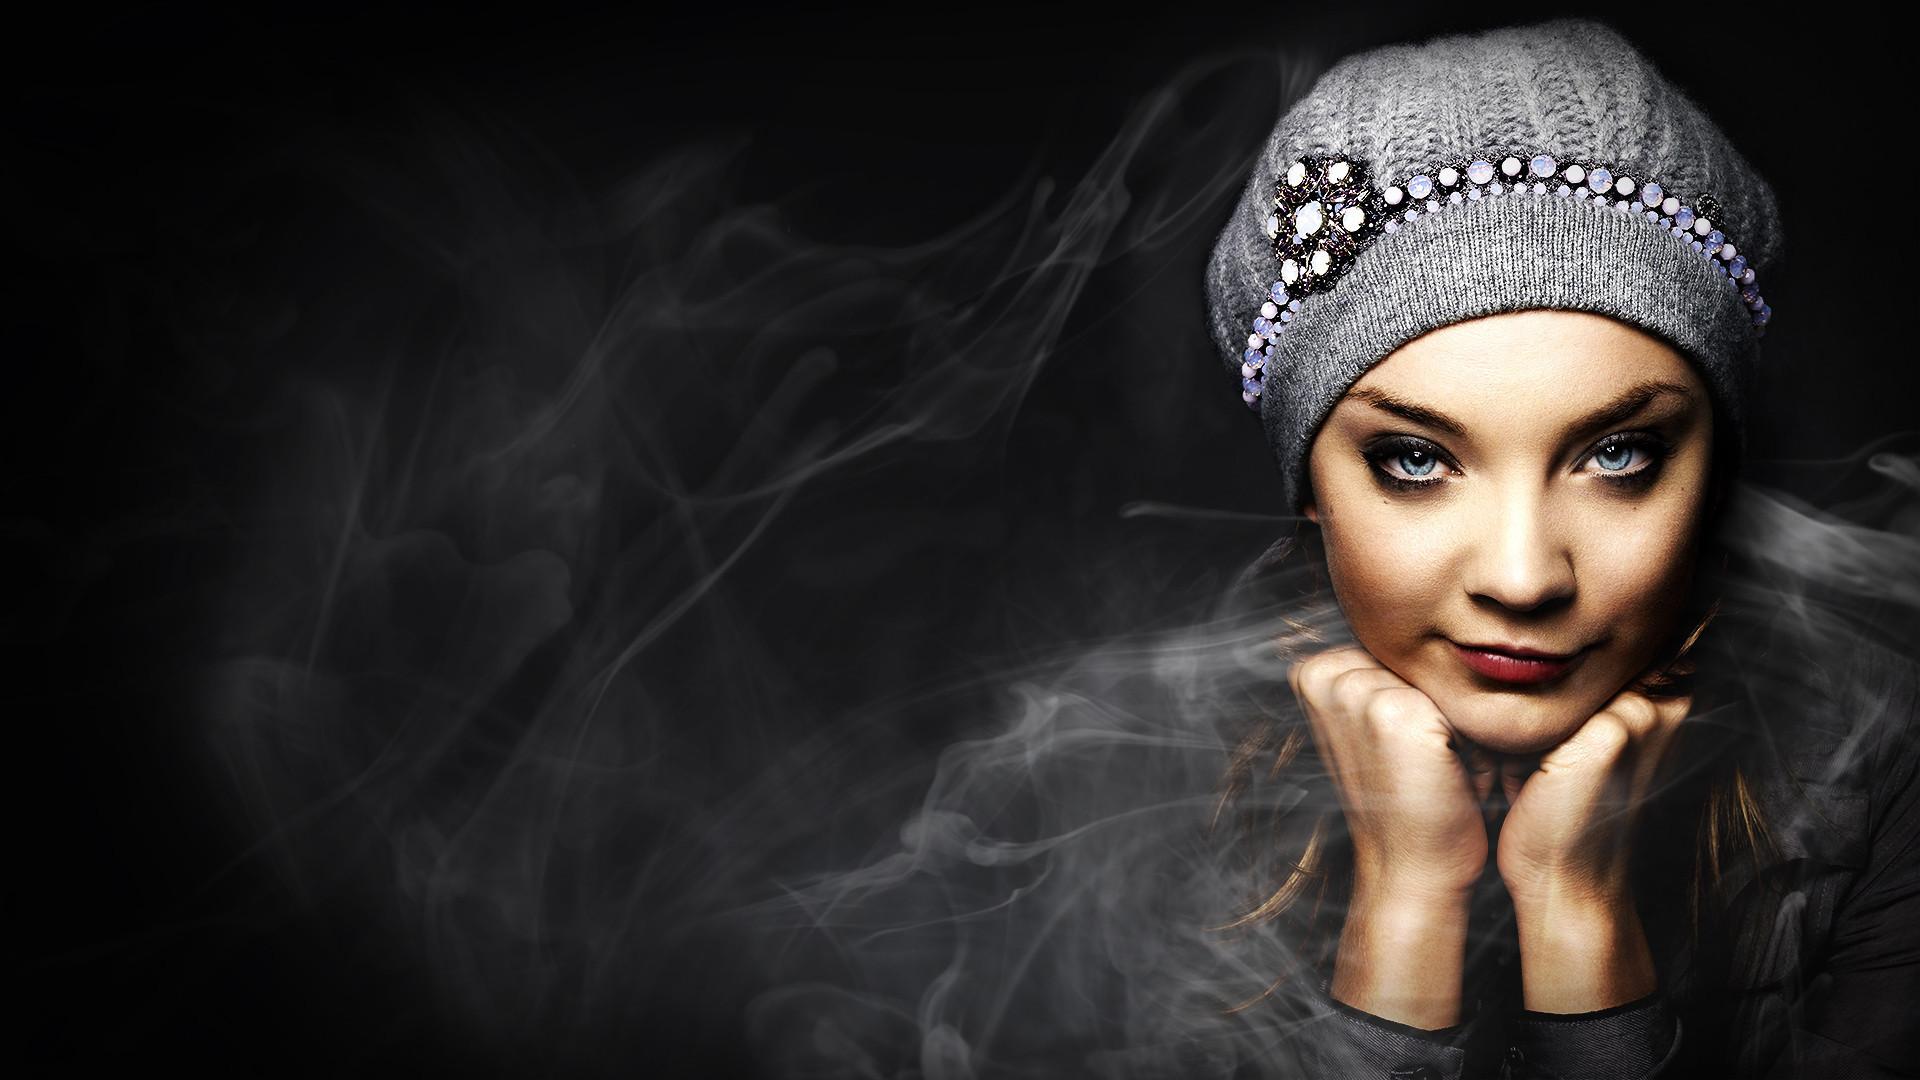 Natalie Dormer Smoky Wallpaper